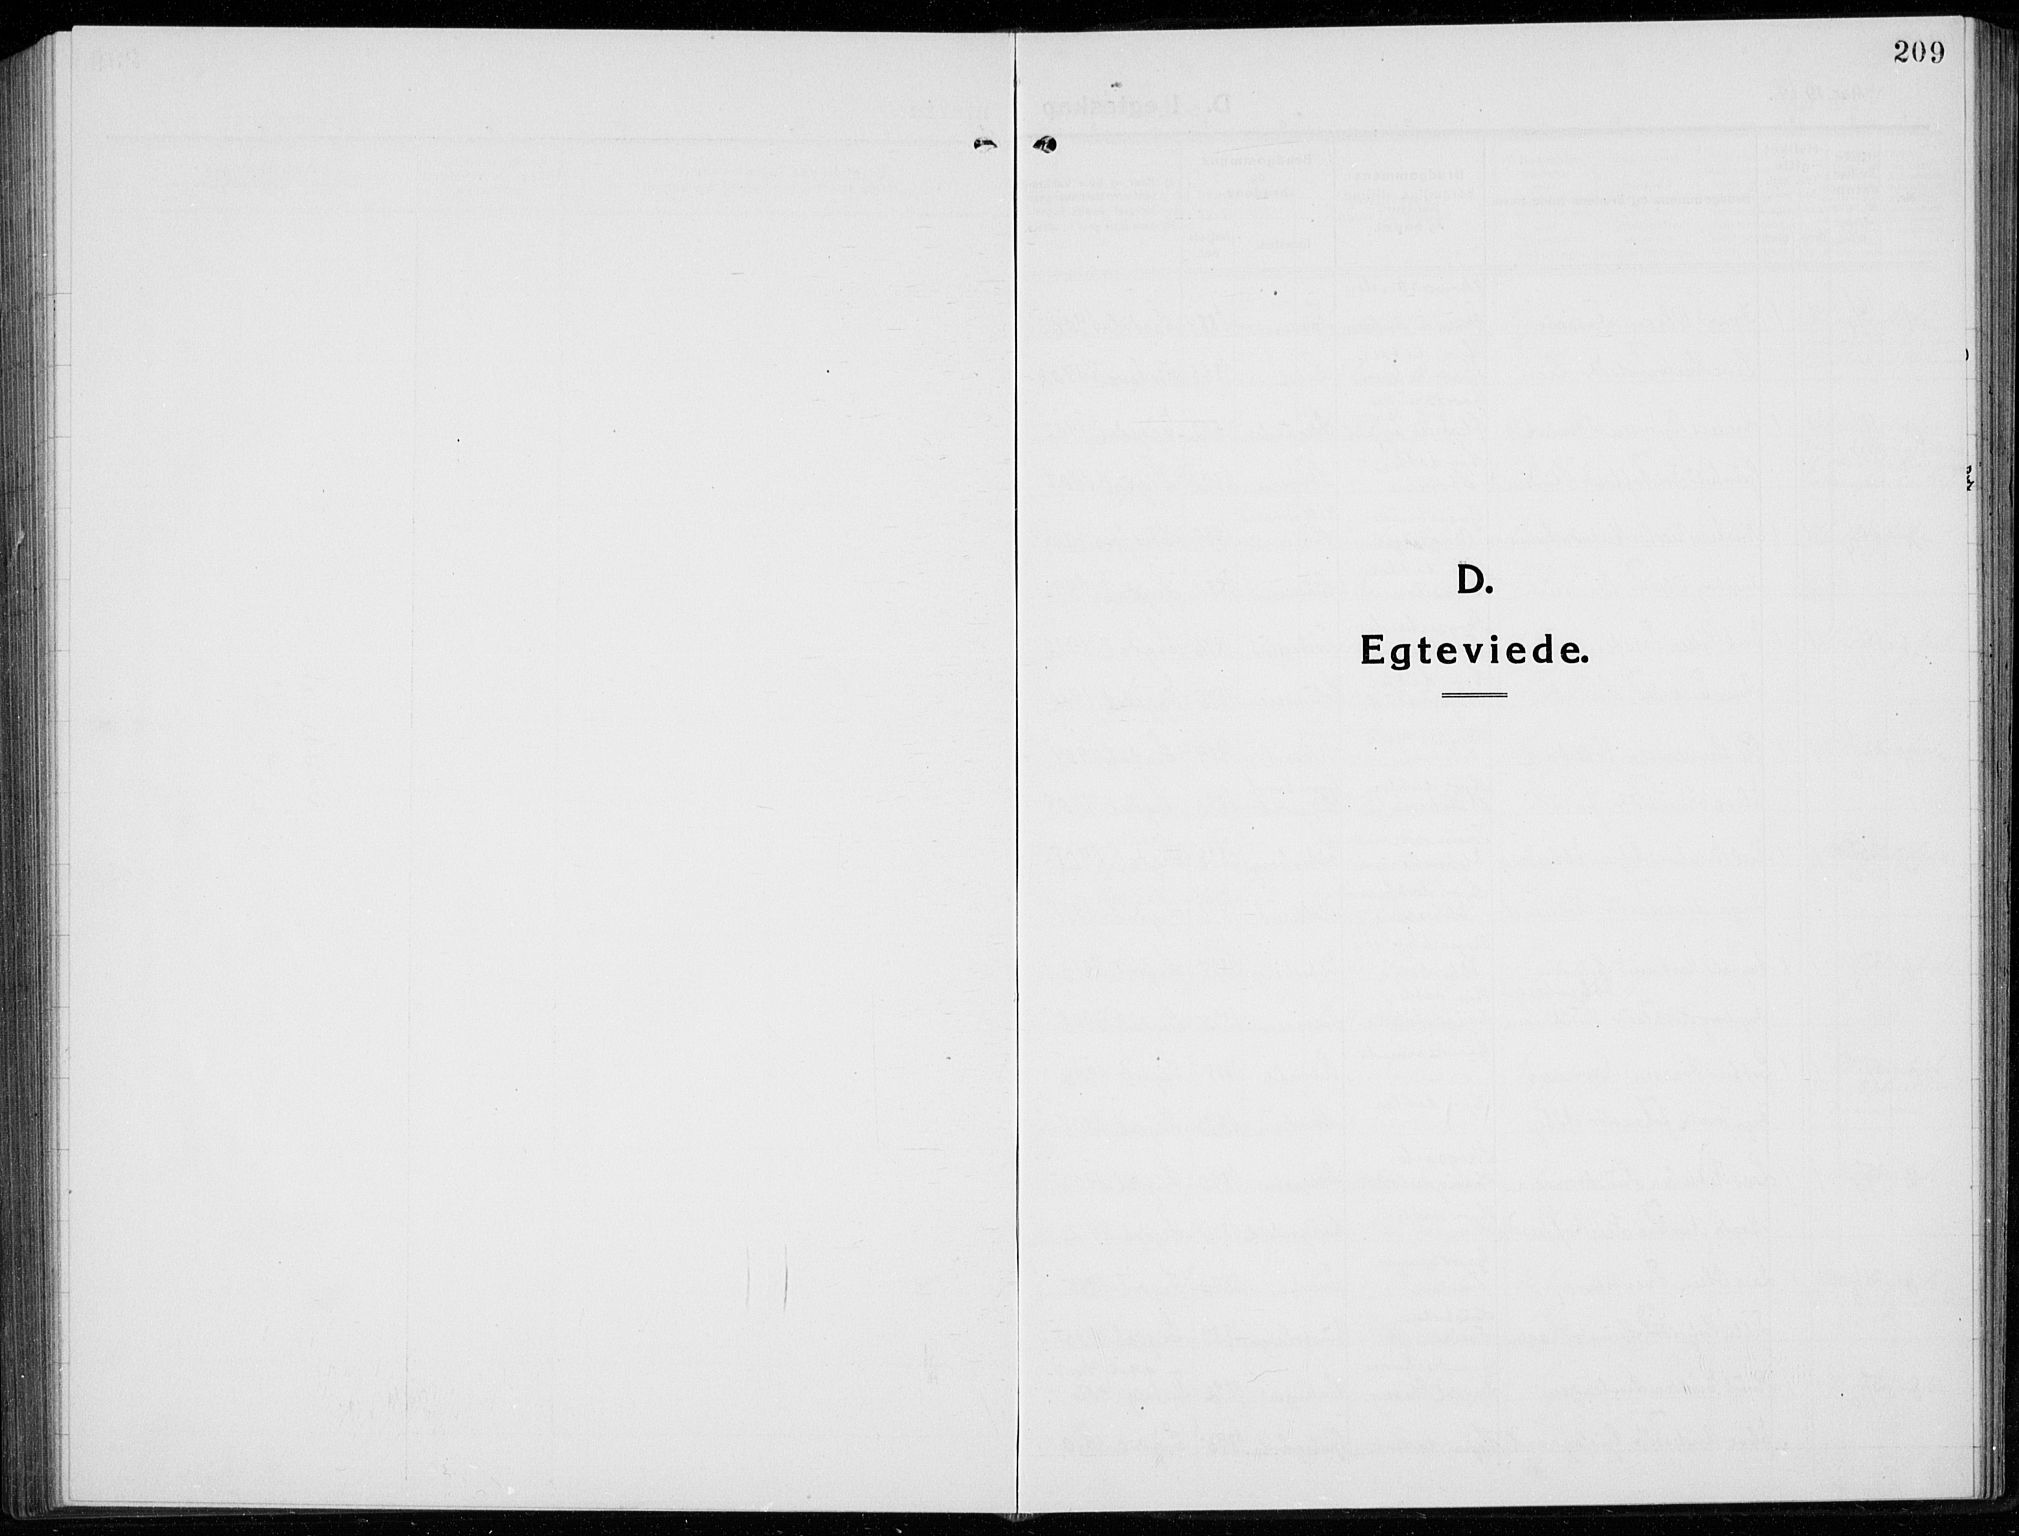 SAKO, Sigdal kirkebøker, G/Ga/L0007: Parish register (copy) no. I 7, 1917-1935, p. 209